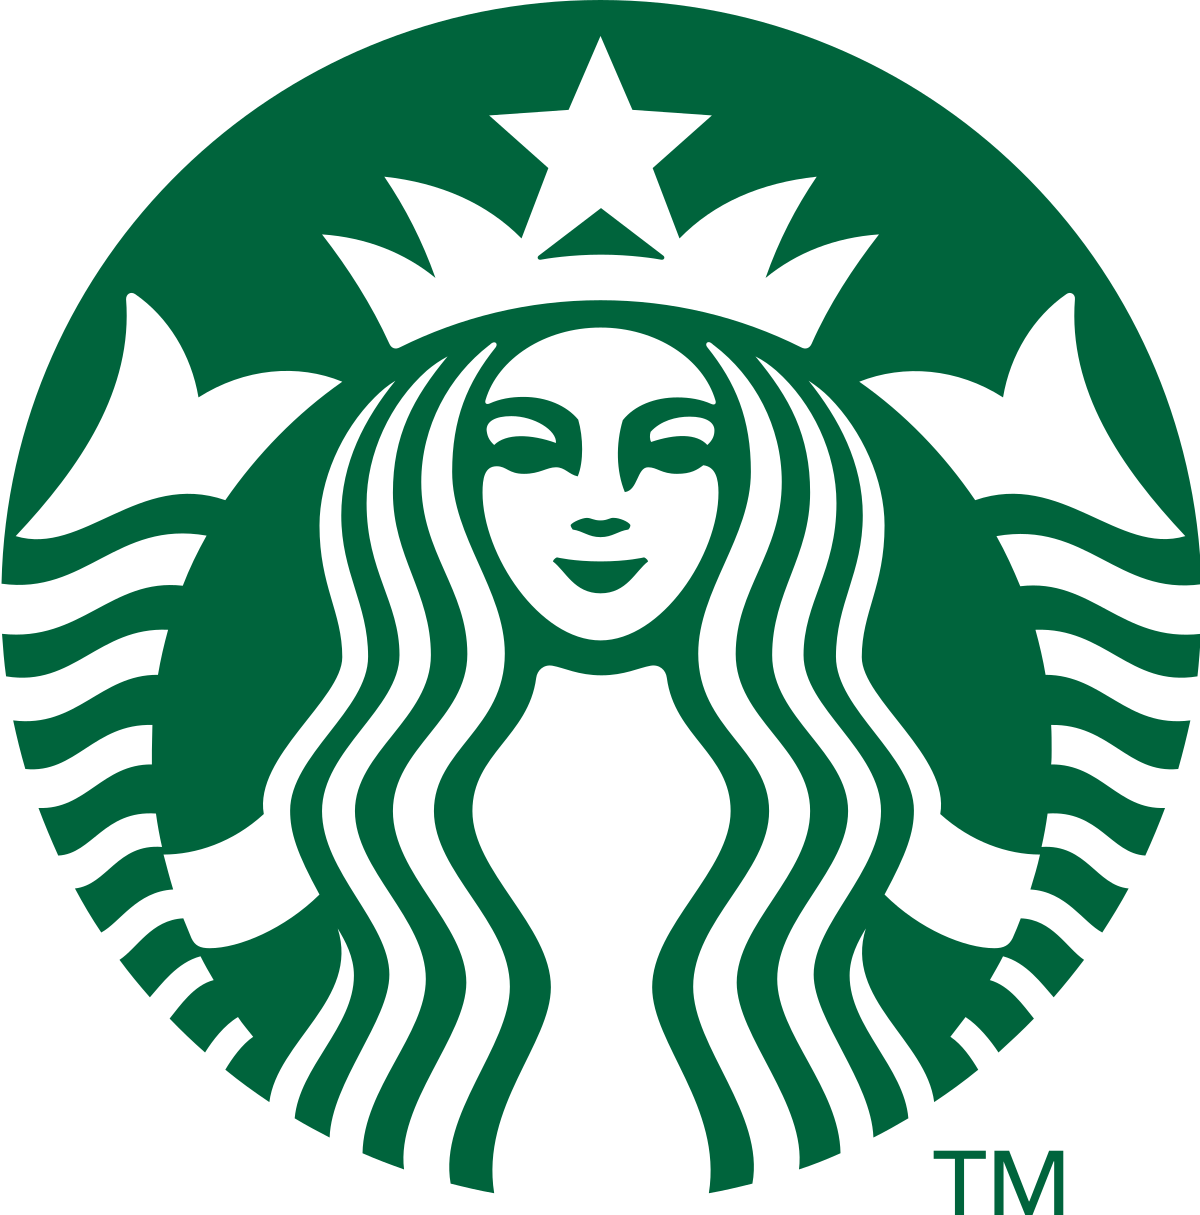 Starbucks - Springhill